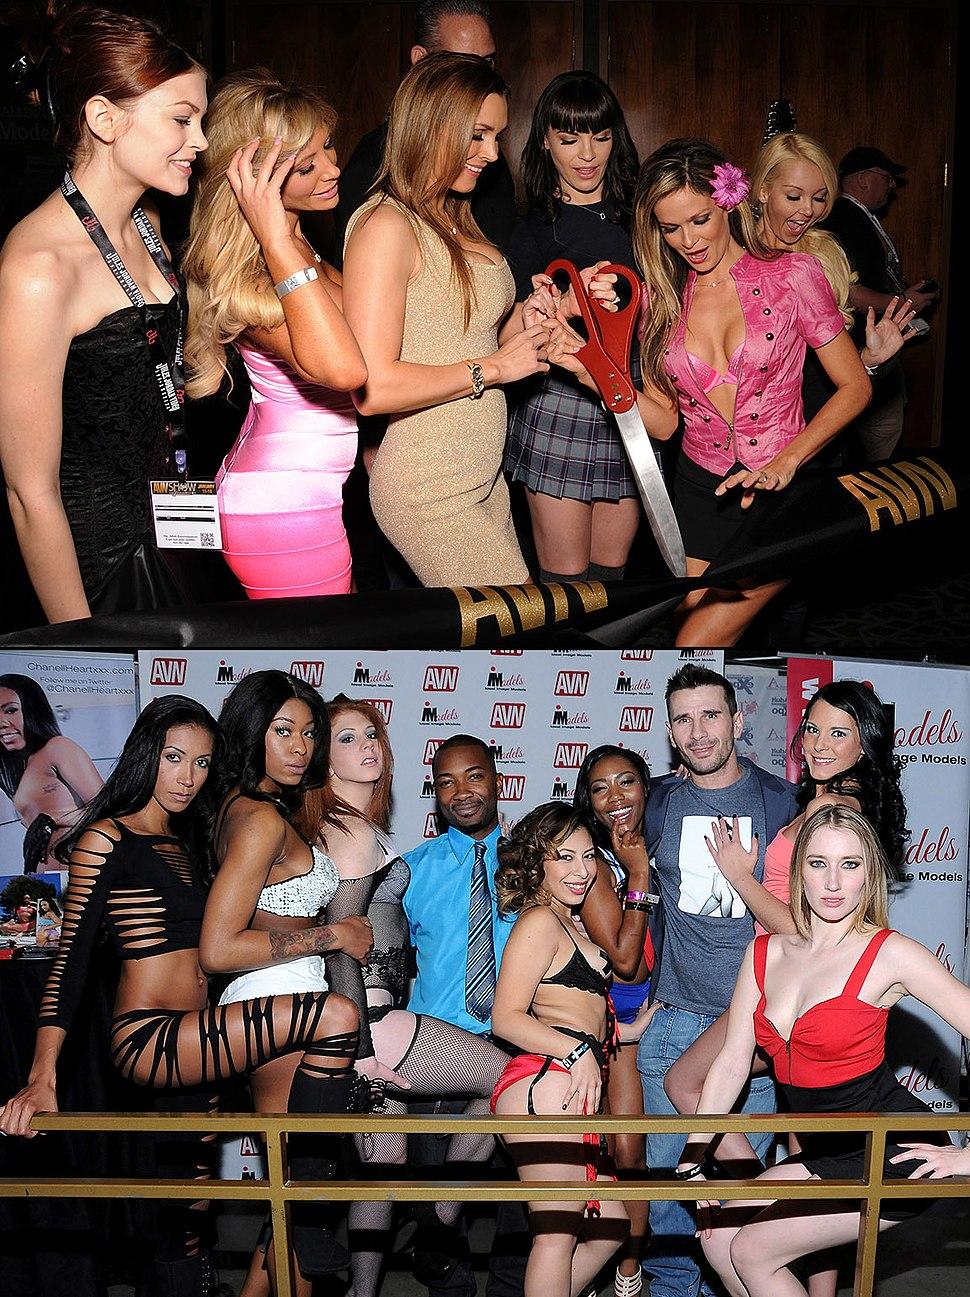 AVN Expo Ribbon Cutting and Models Hard Rock Hotel 2014